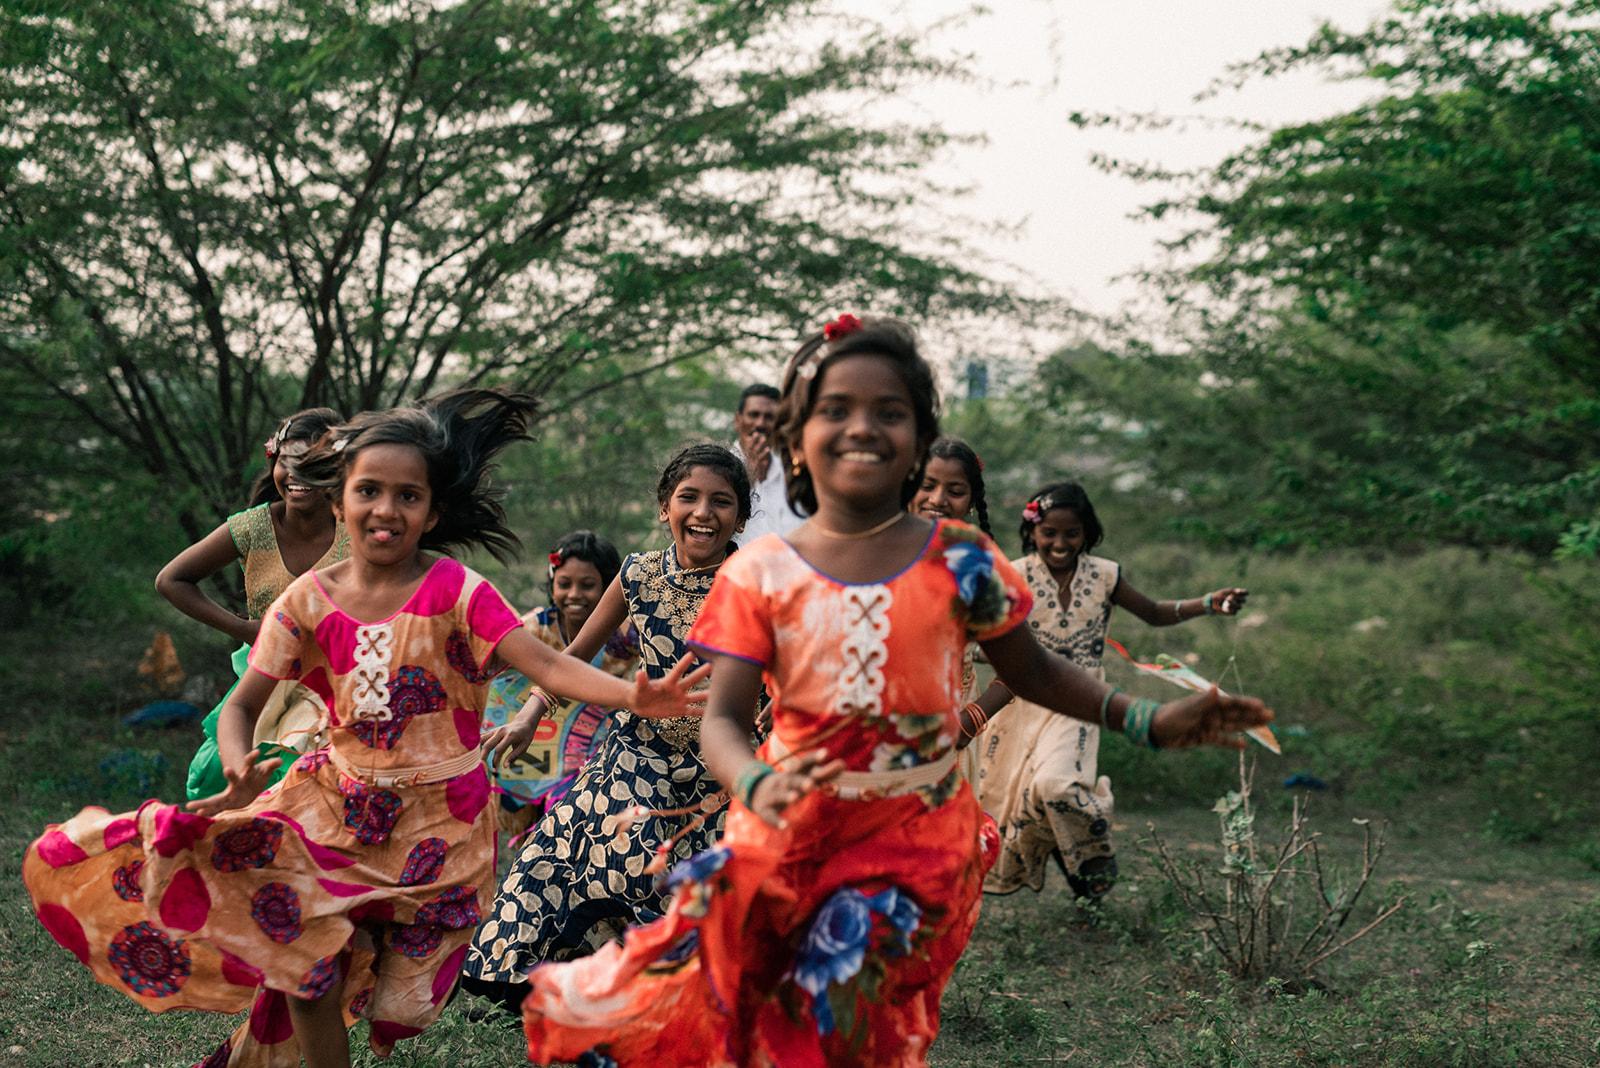 CCH_INDIA_HUMANITARIAN_NGO_TaraShupe_Photography_DSC_8897.jpg